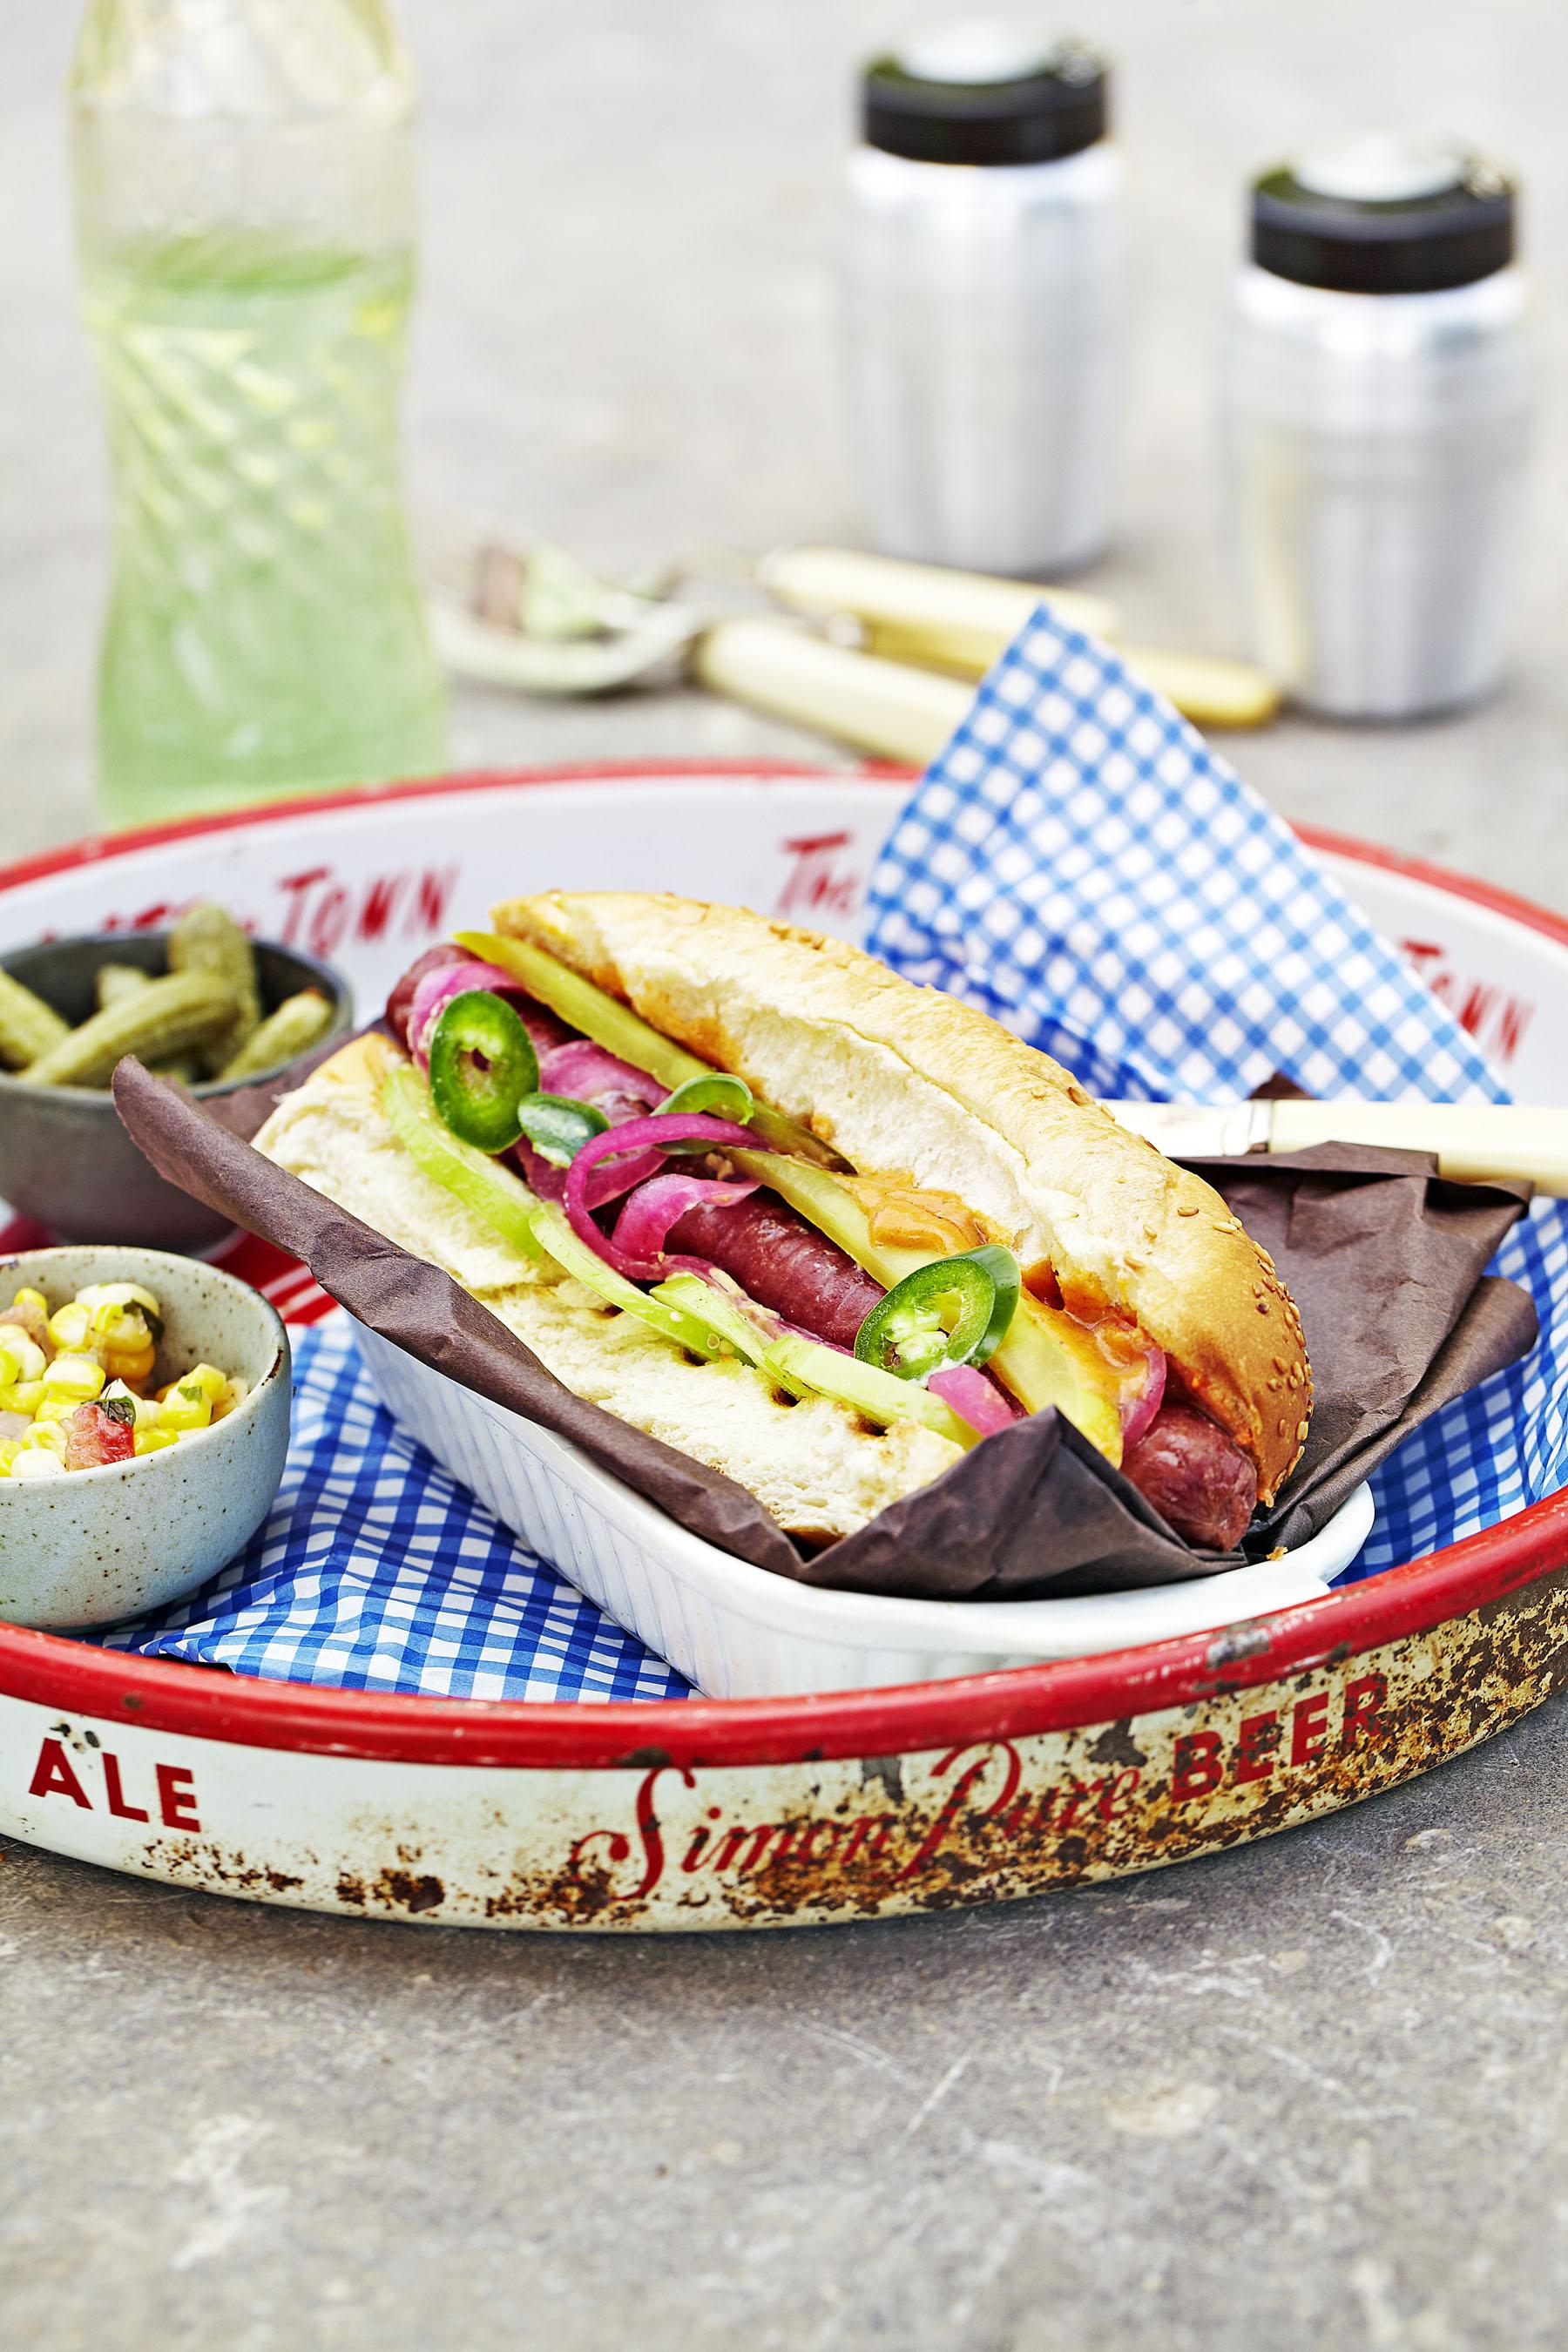 Hotdog_Rustic picnic.jpg